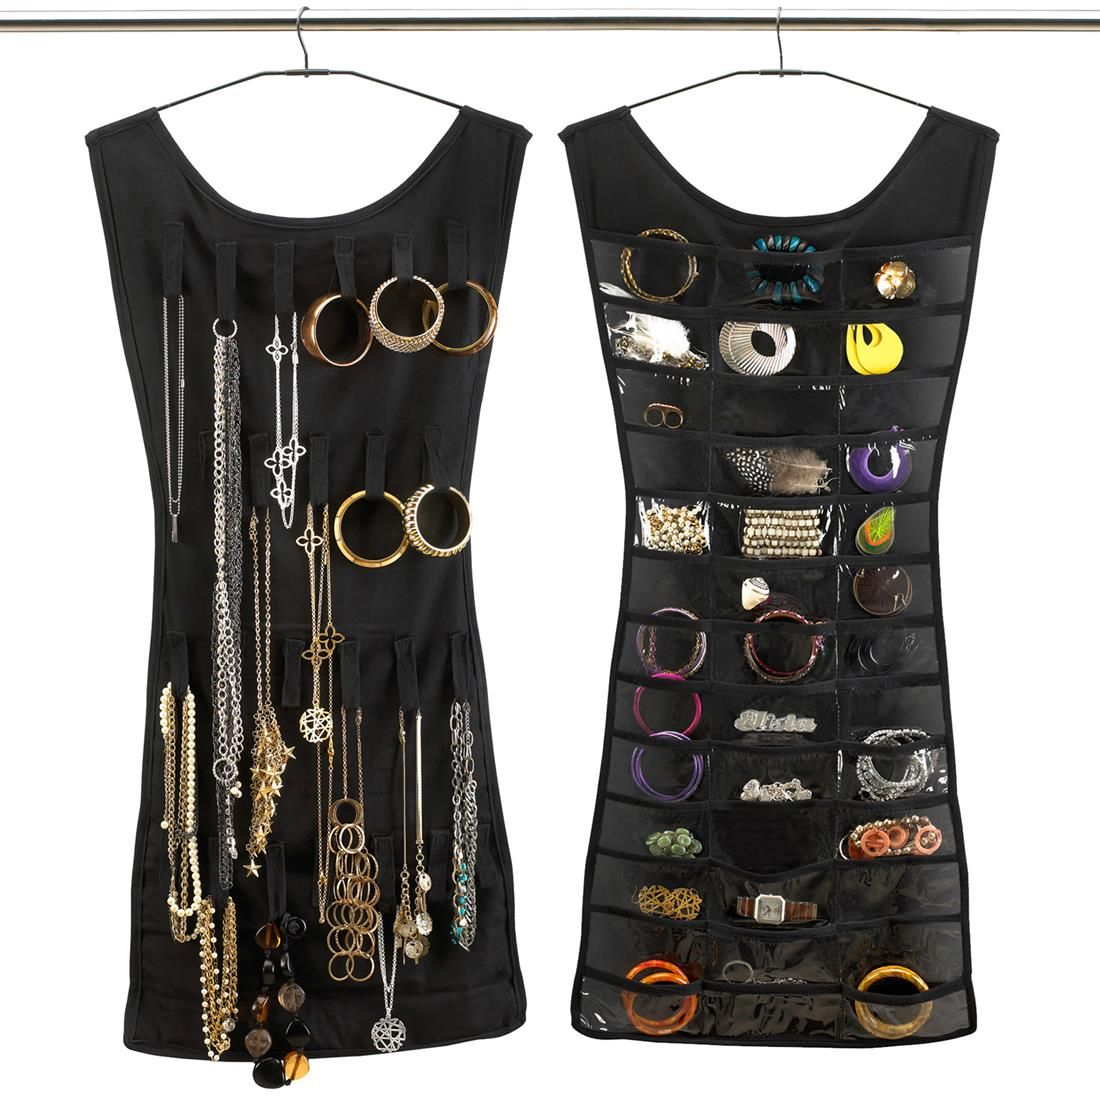 Cabide para Bijuteria Vestido Organizao Pinterest